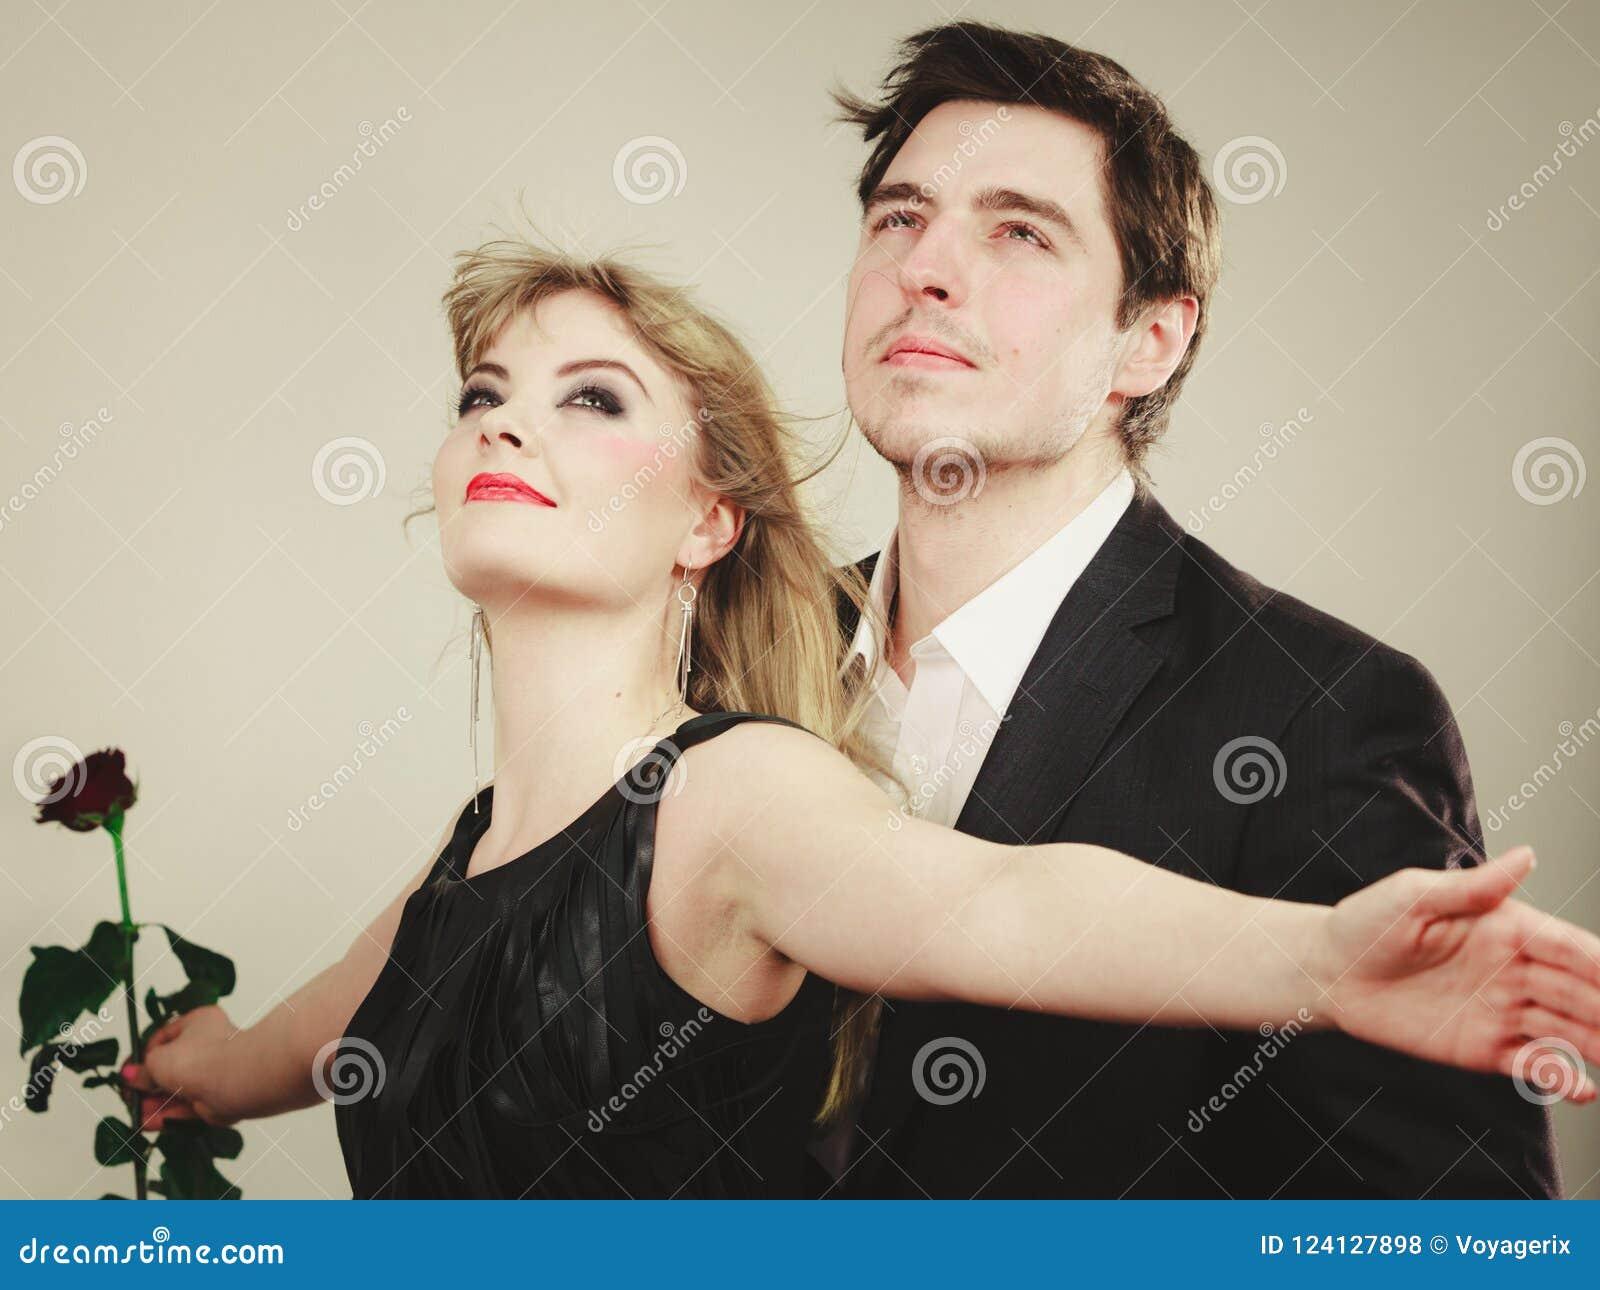 Dating στο κατώφλι σου διπλή ημερομηνία dating ιστοσελίδα UK